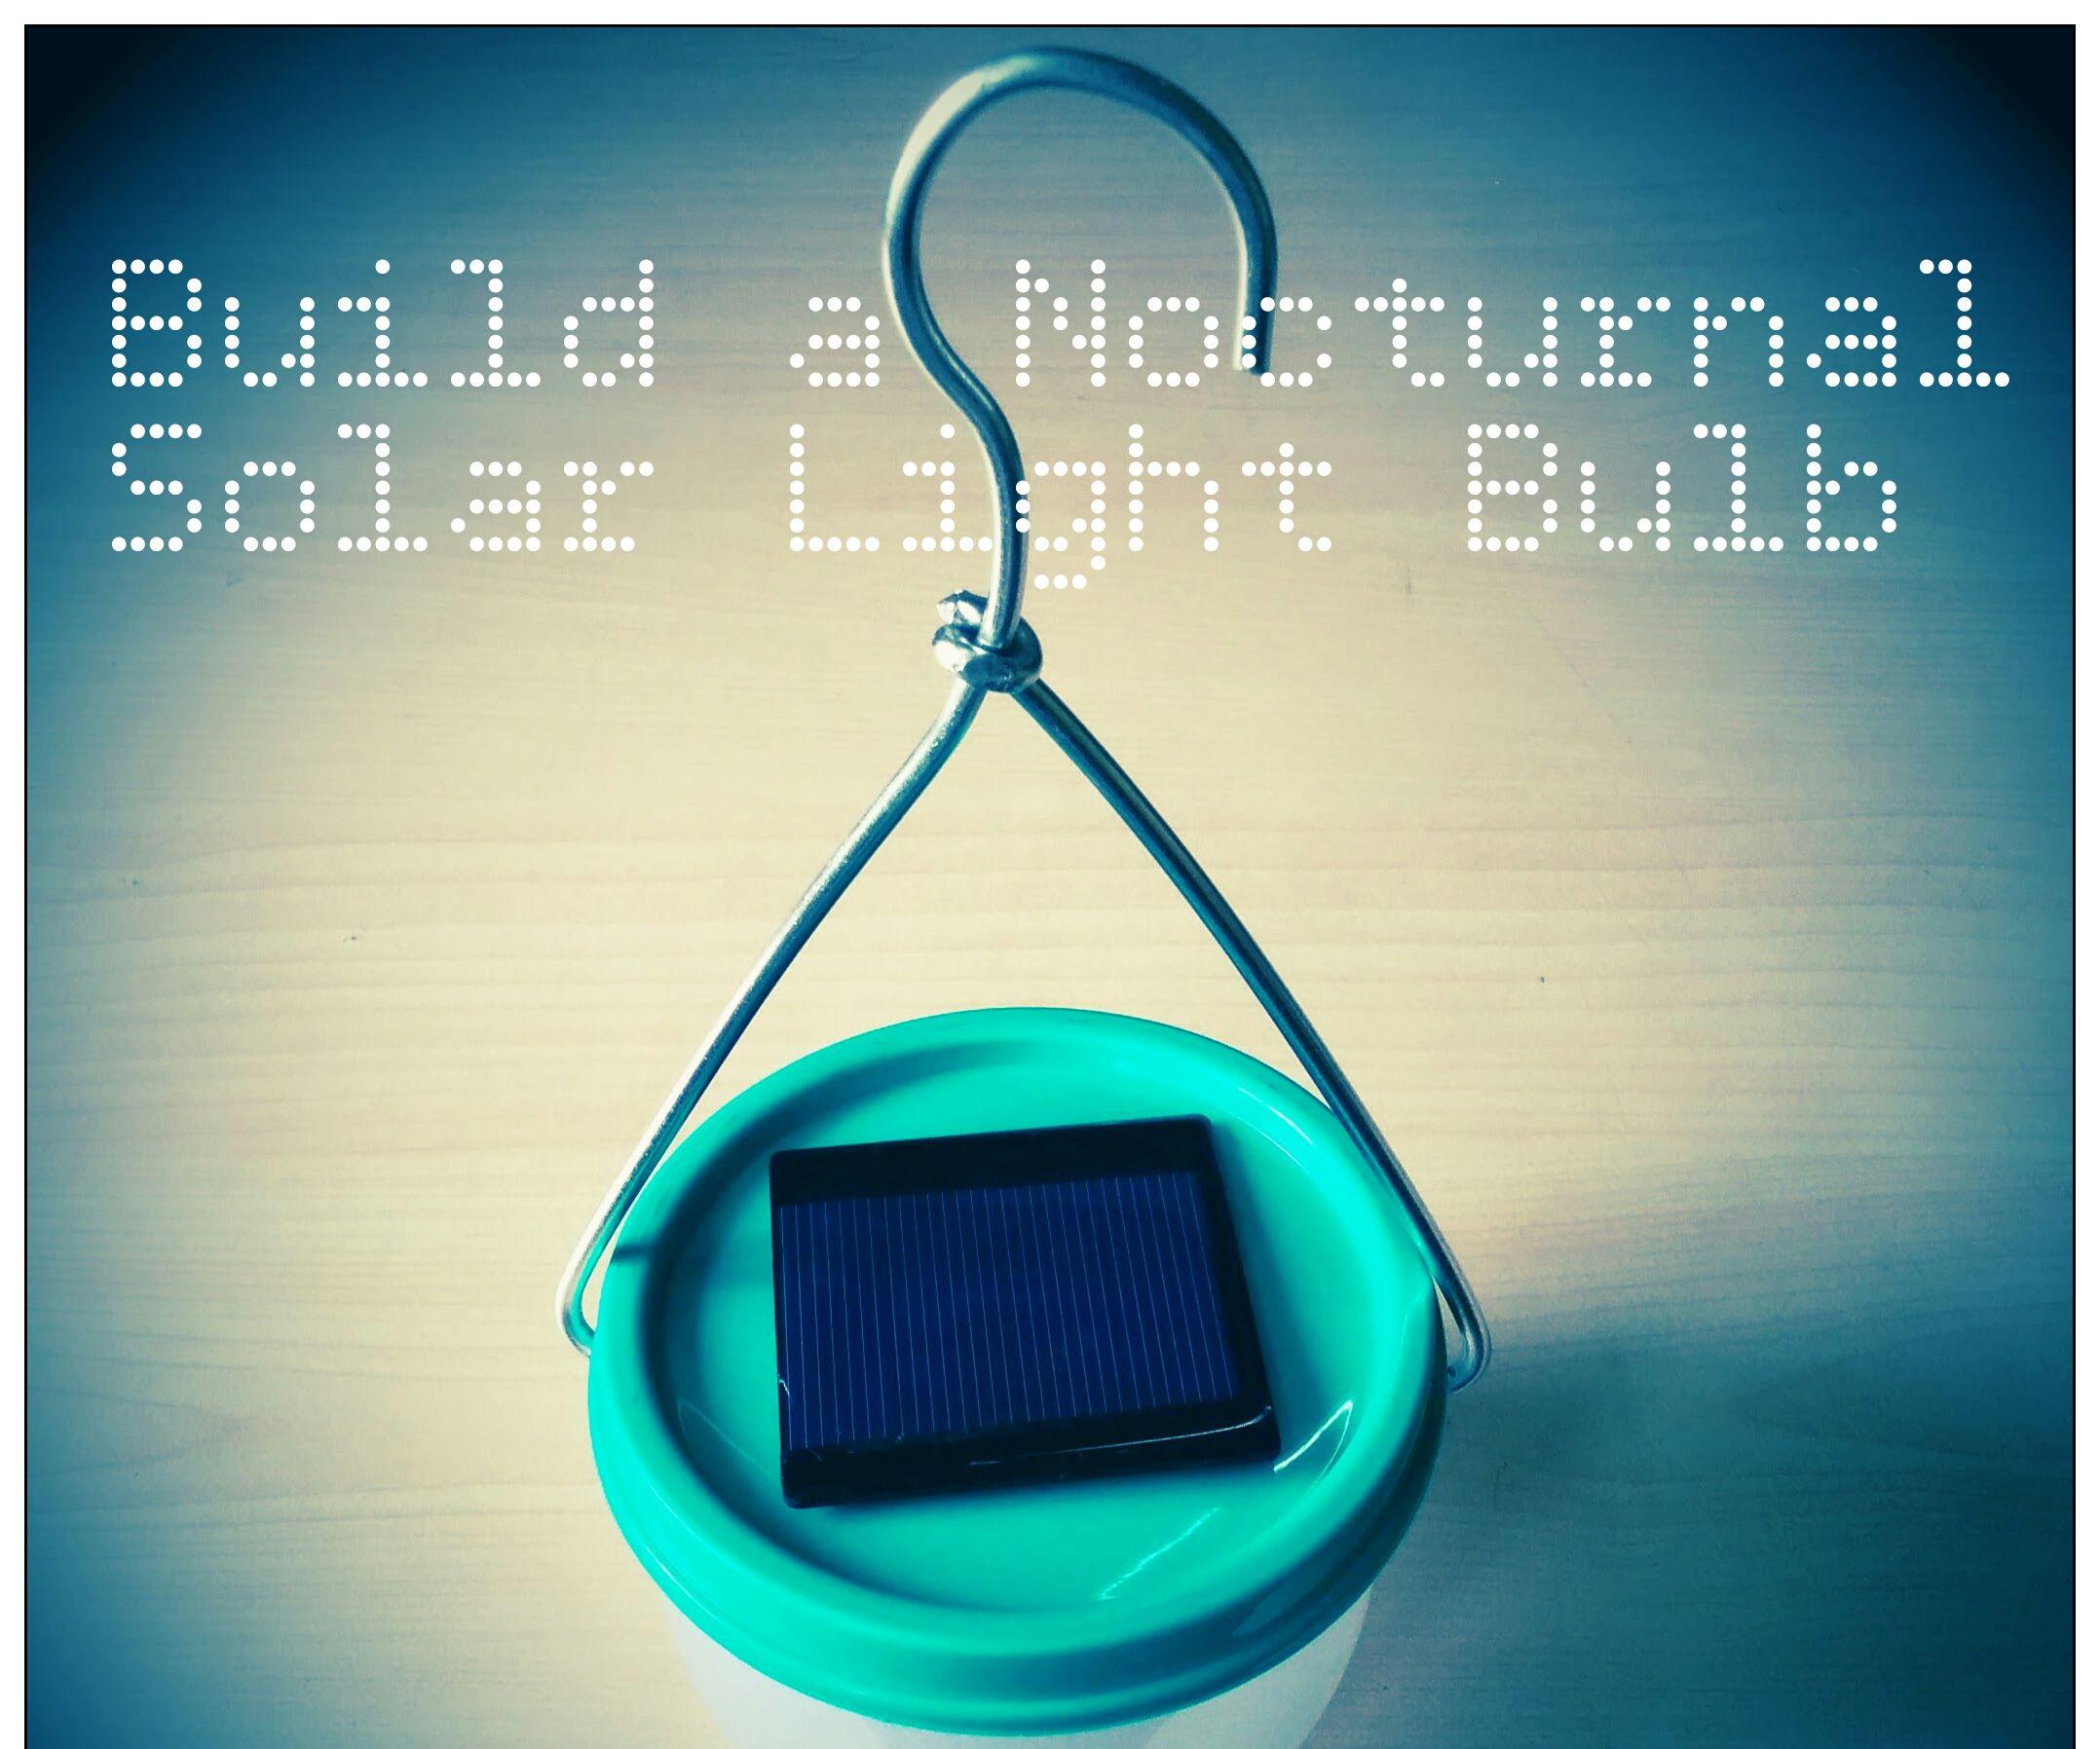 BUILD A NOCTURNAL SOLAR LIGHT BULB